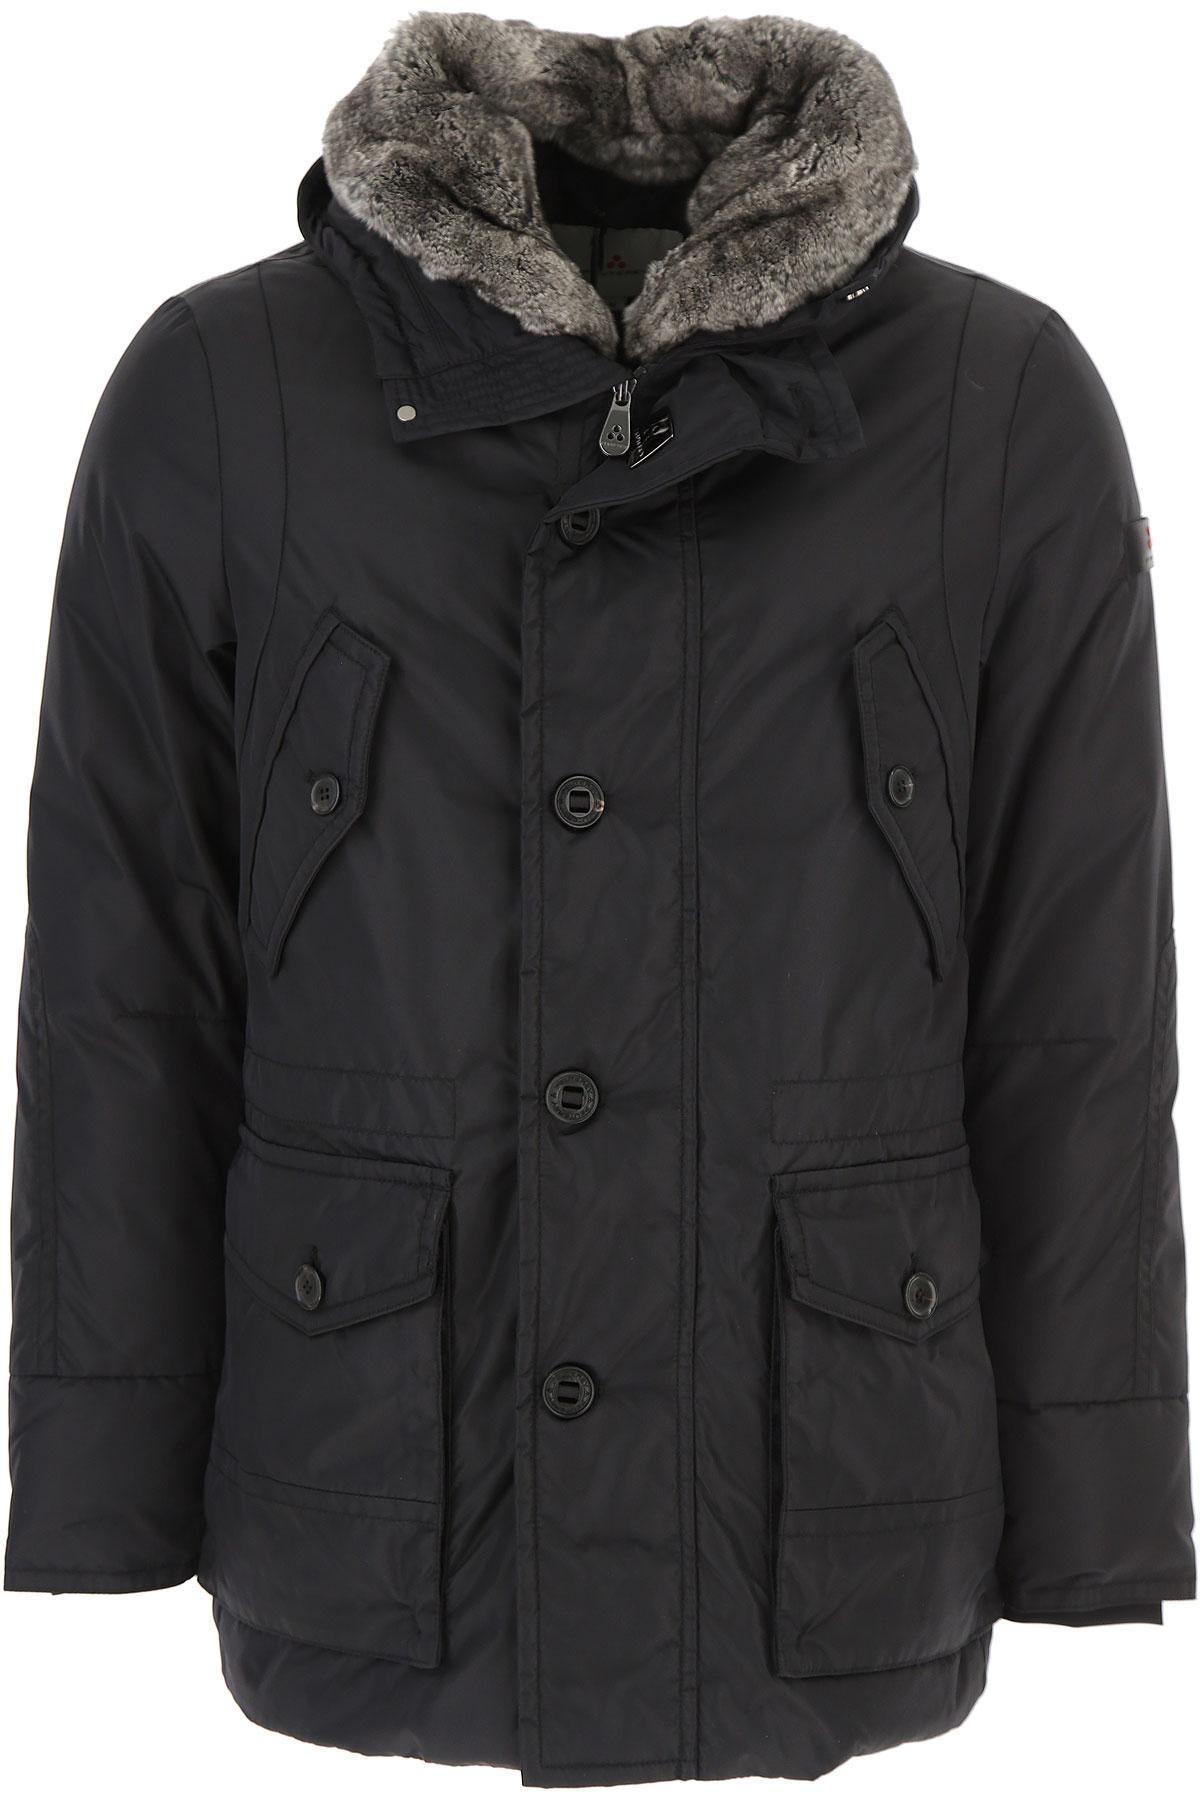 Image of Peuterey Down Jacket for Men, Puffer Ski Jacket, Black, Down, 2017, L S XL XXL